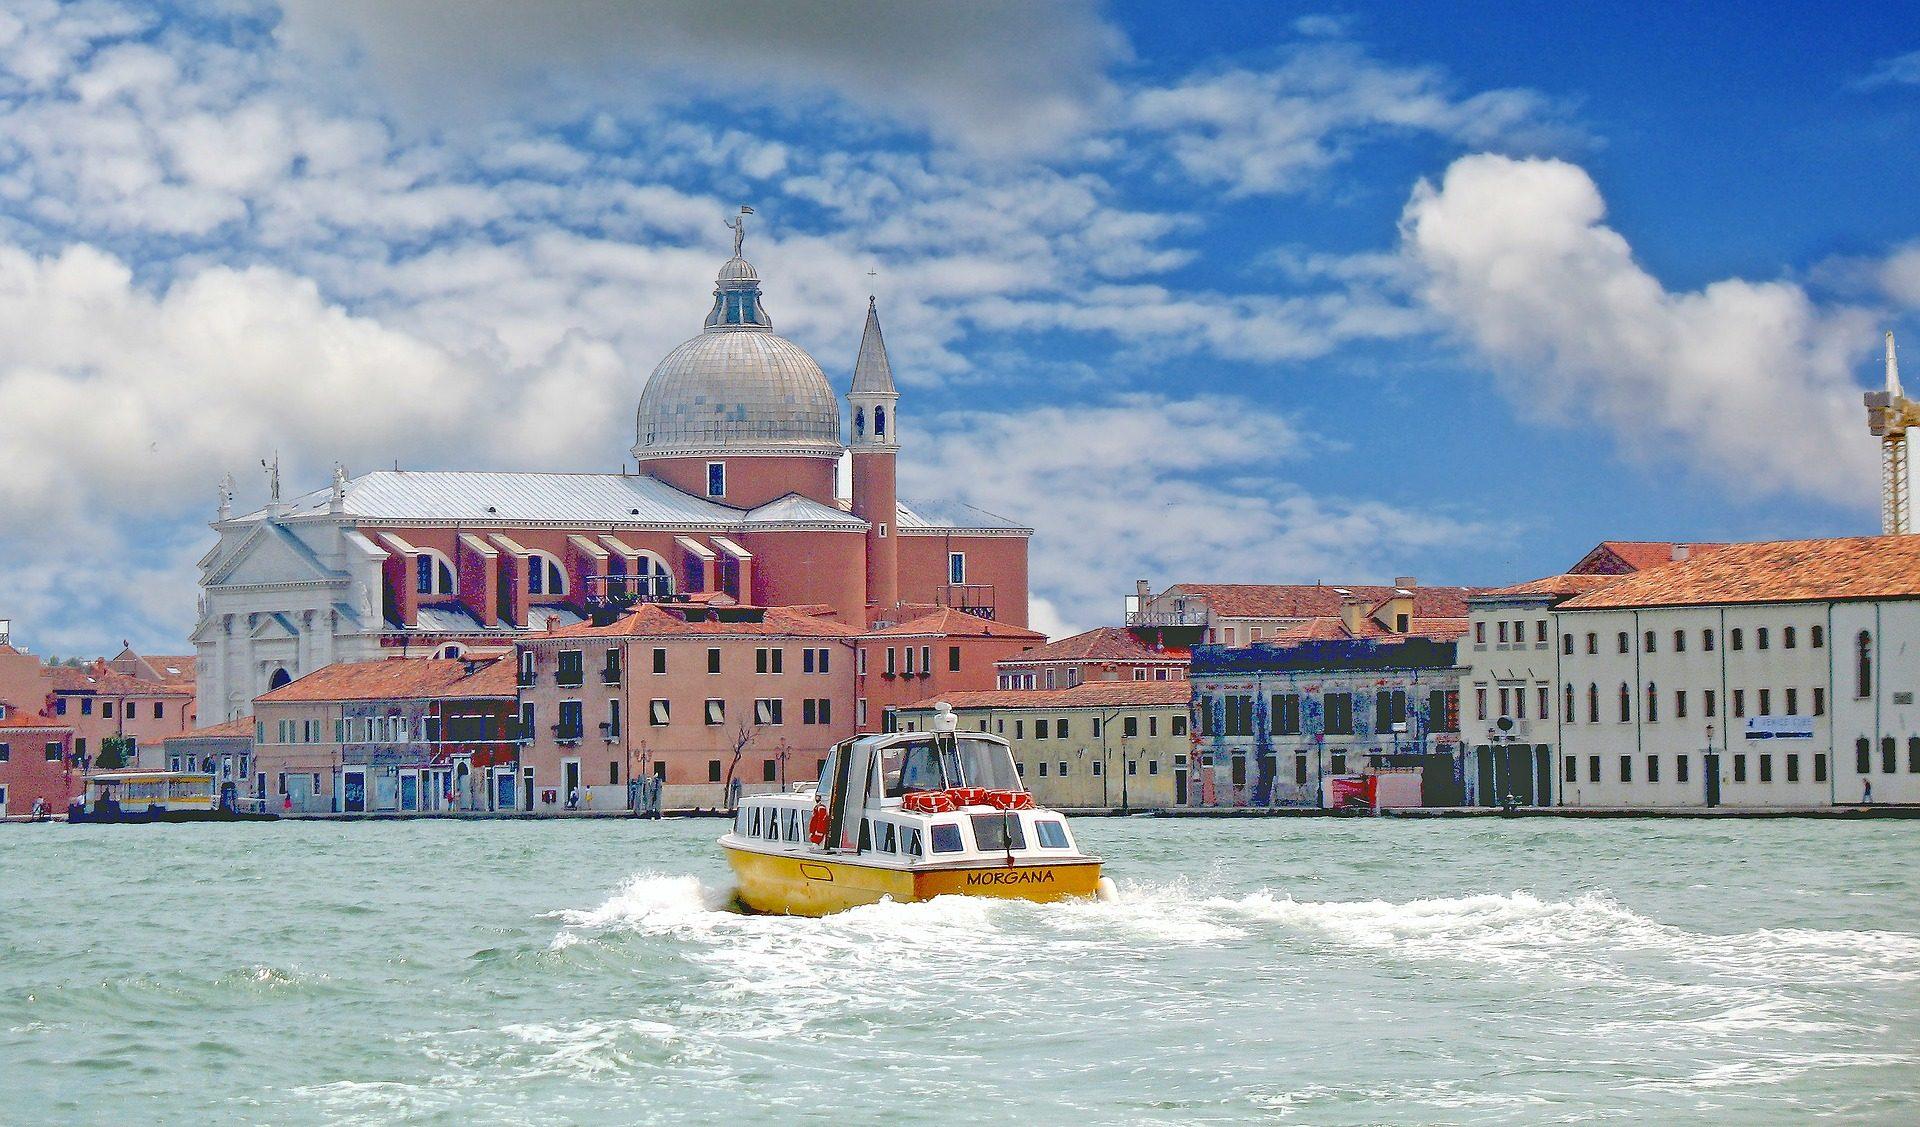 bateau, Mer, Costa, bâtiments, Église, Dôme, Italie - Fonds d'écran HD - Professor-falken.com